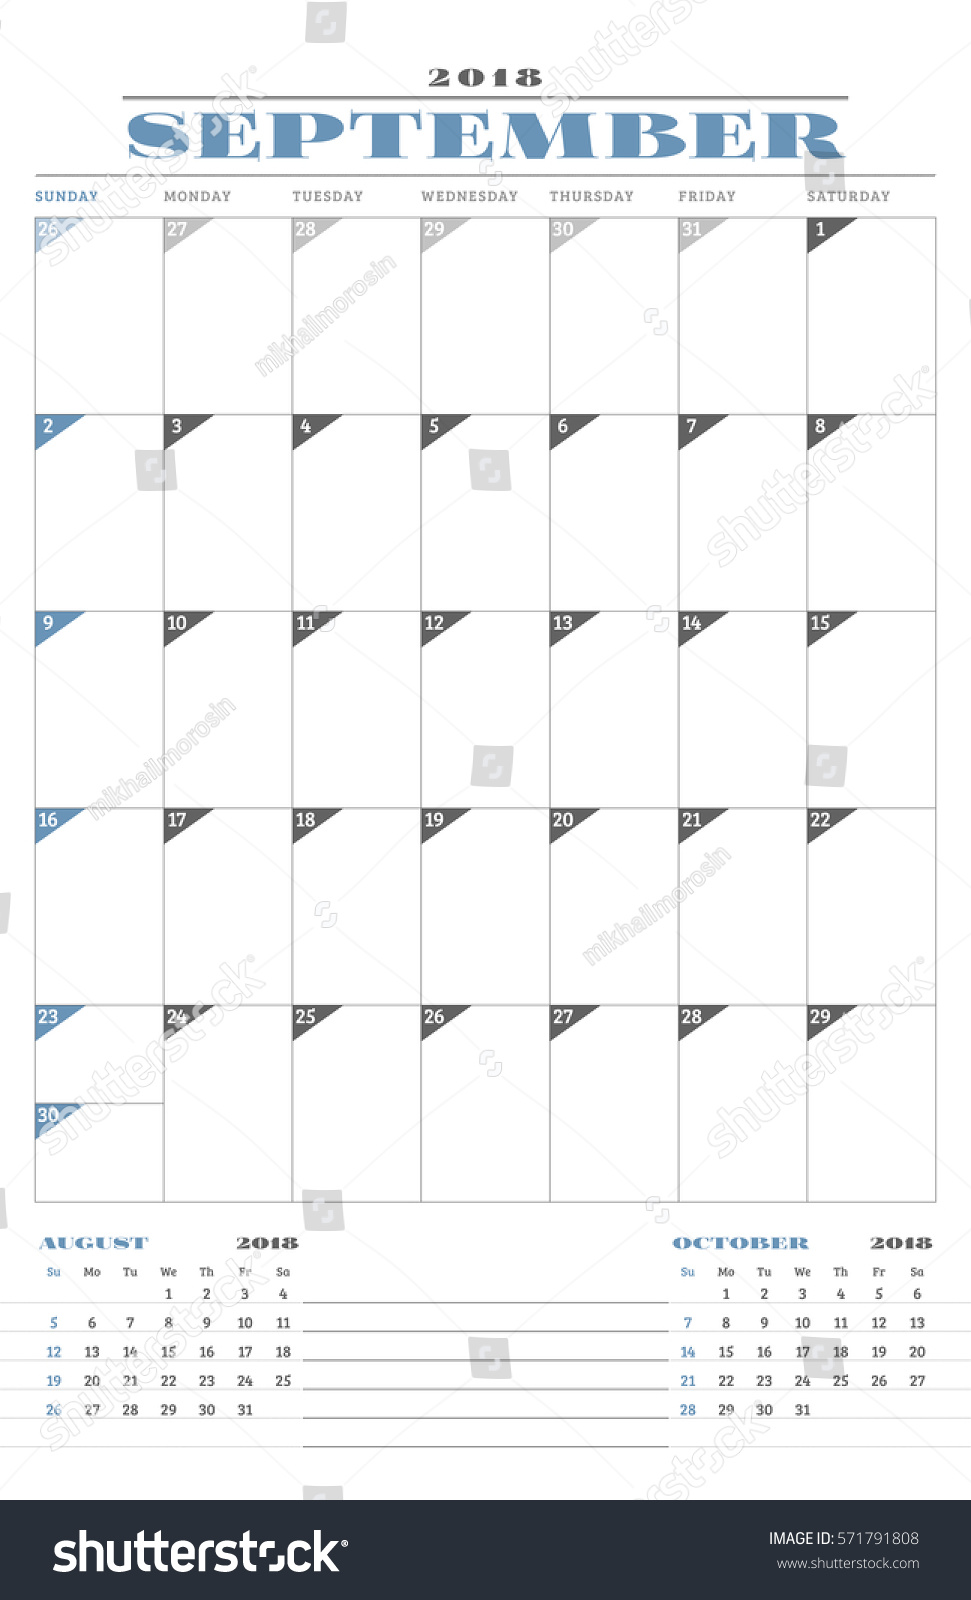 Calendar Planner Vector : Calendar planner template year september stock vector